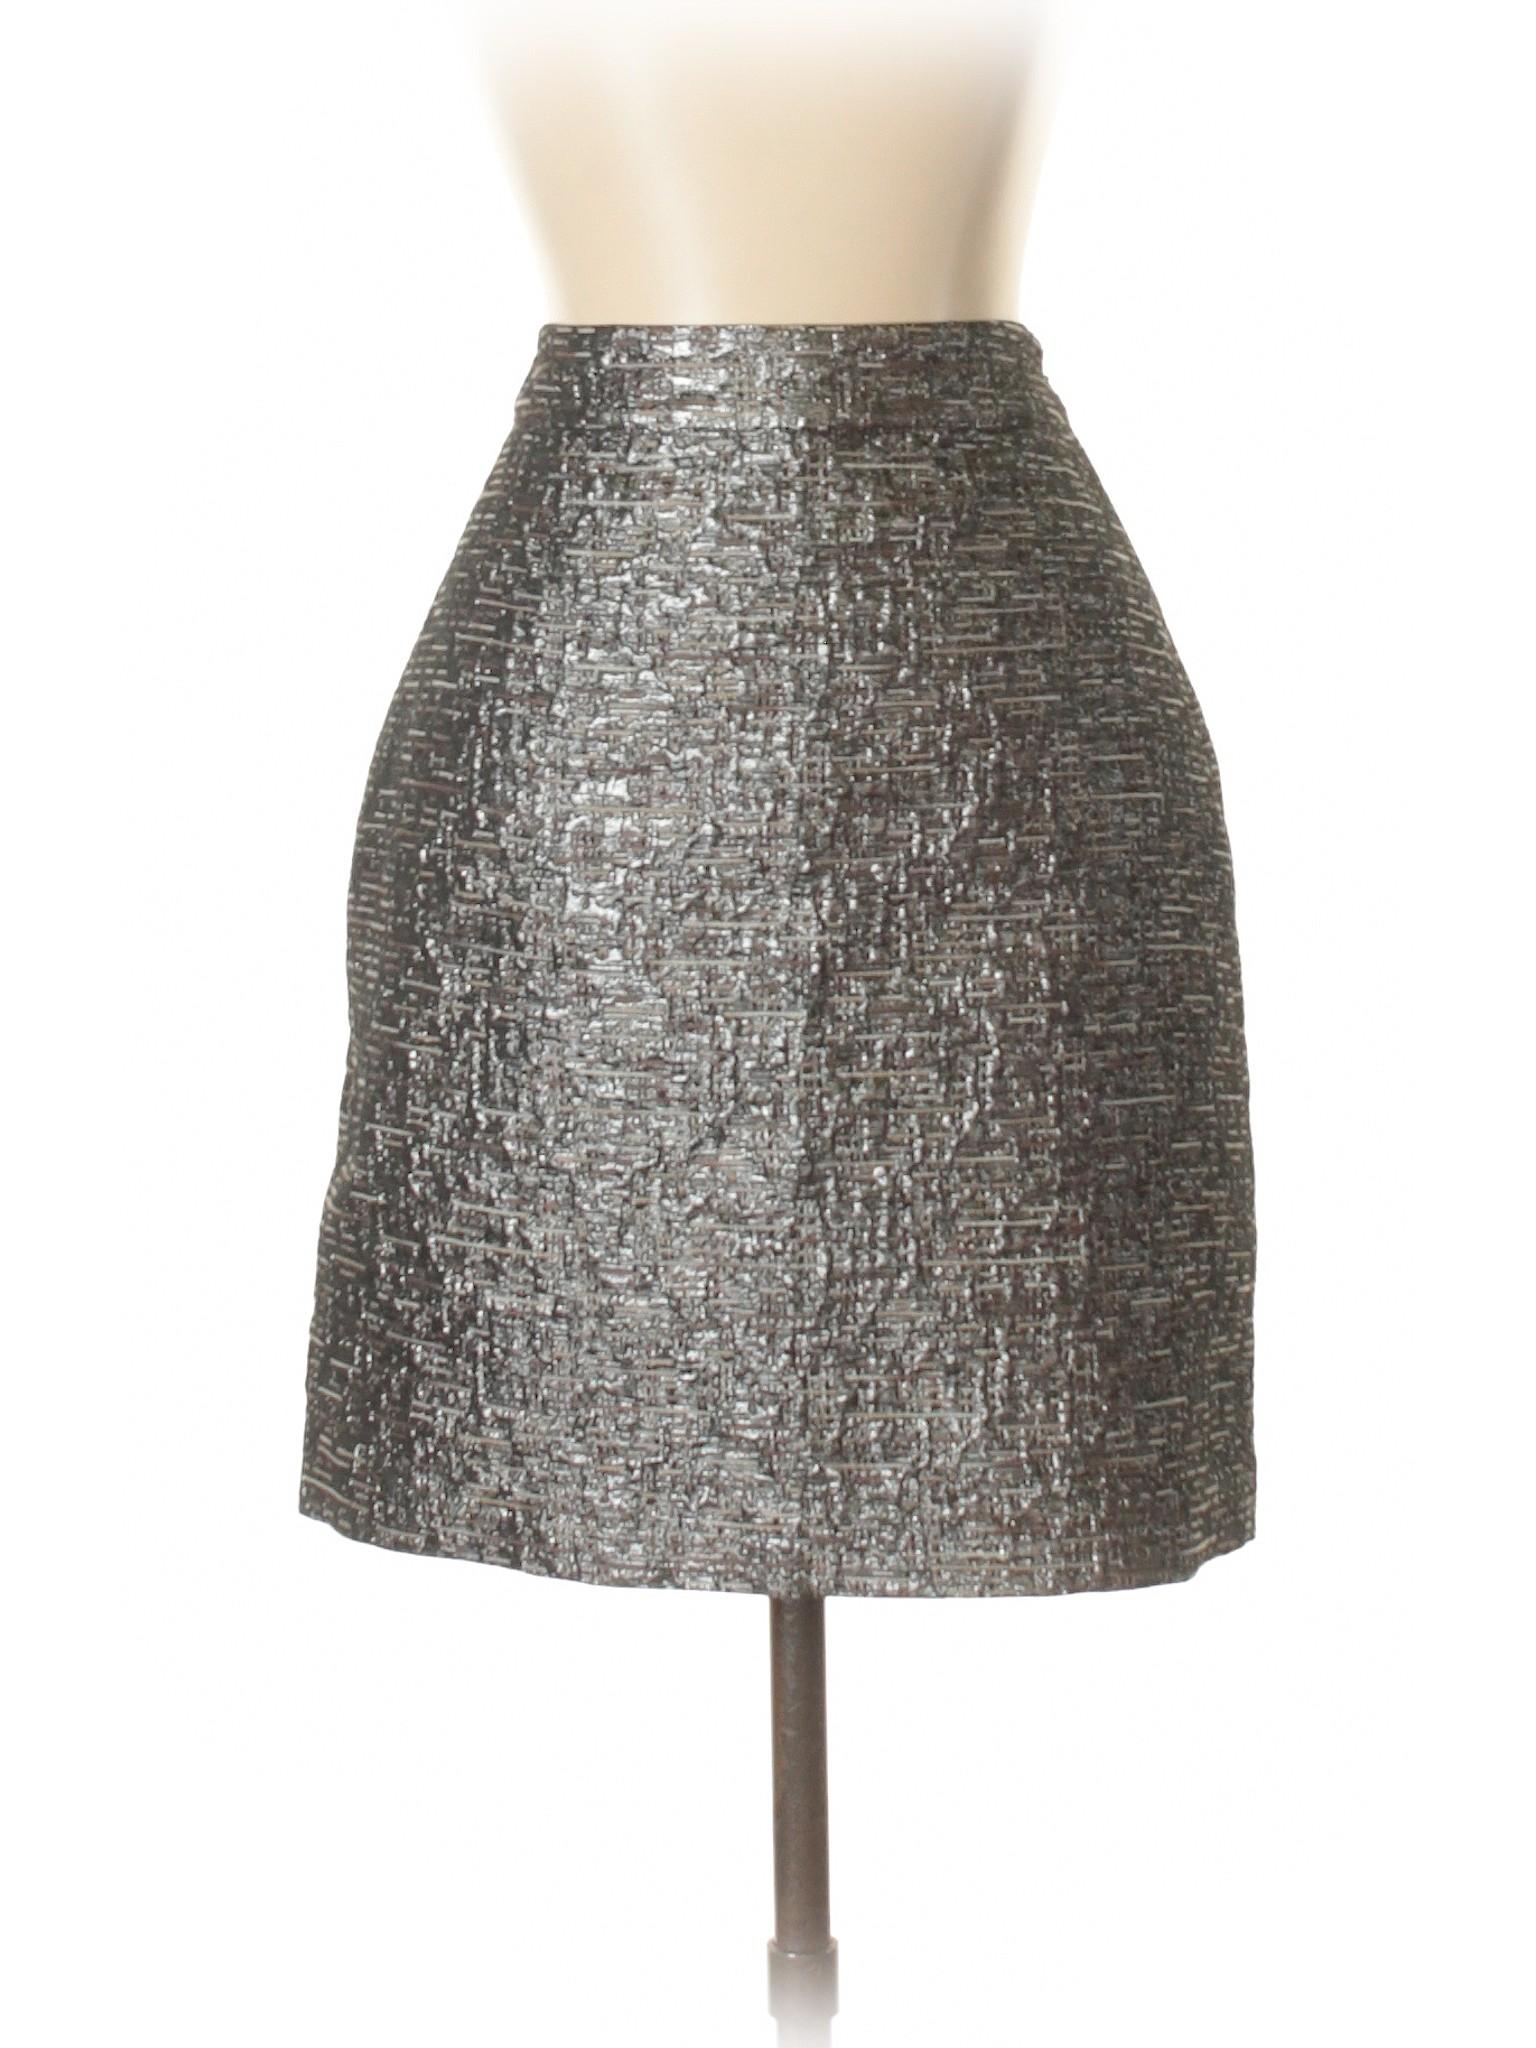 Formal Skirt Republic Banana Leisure winter qw0xfH7z